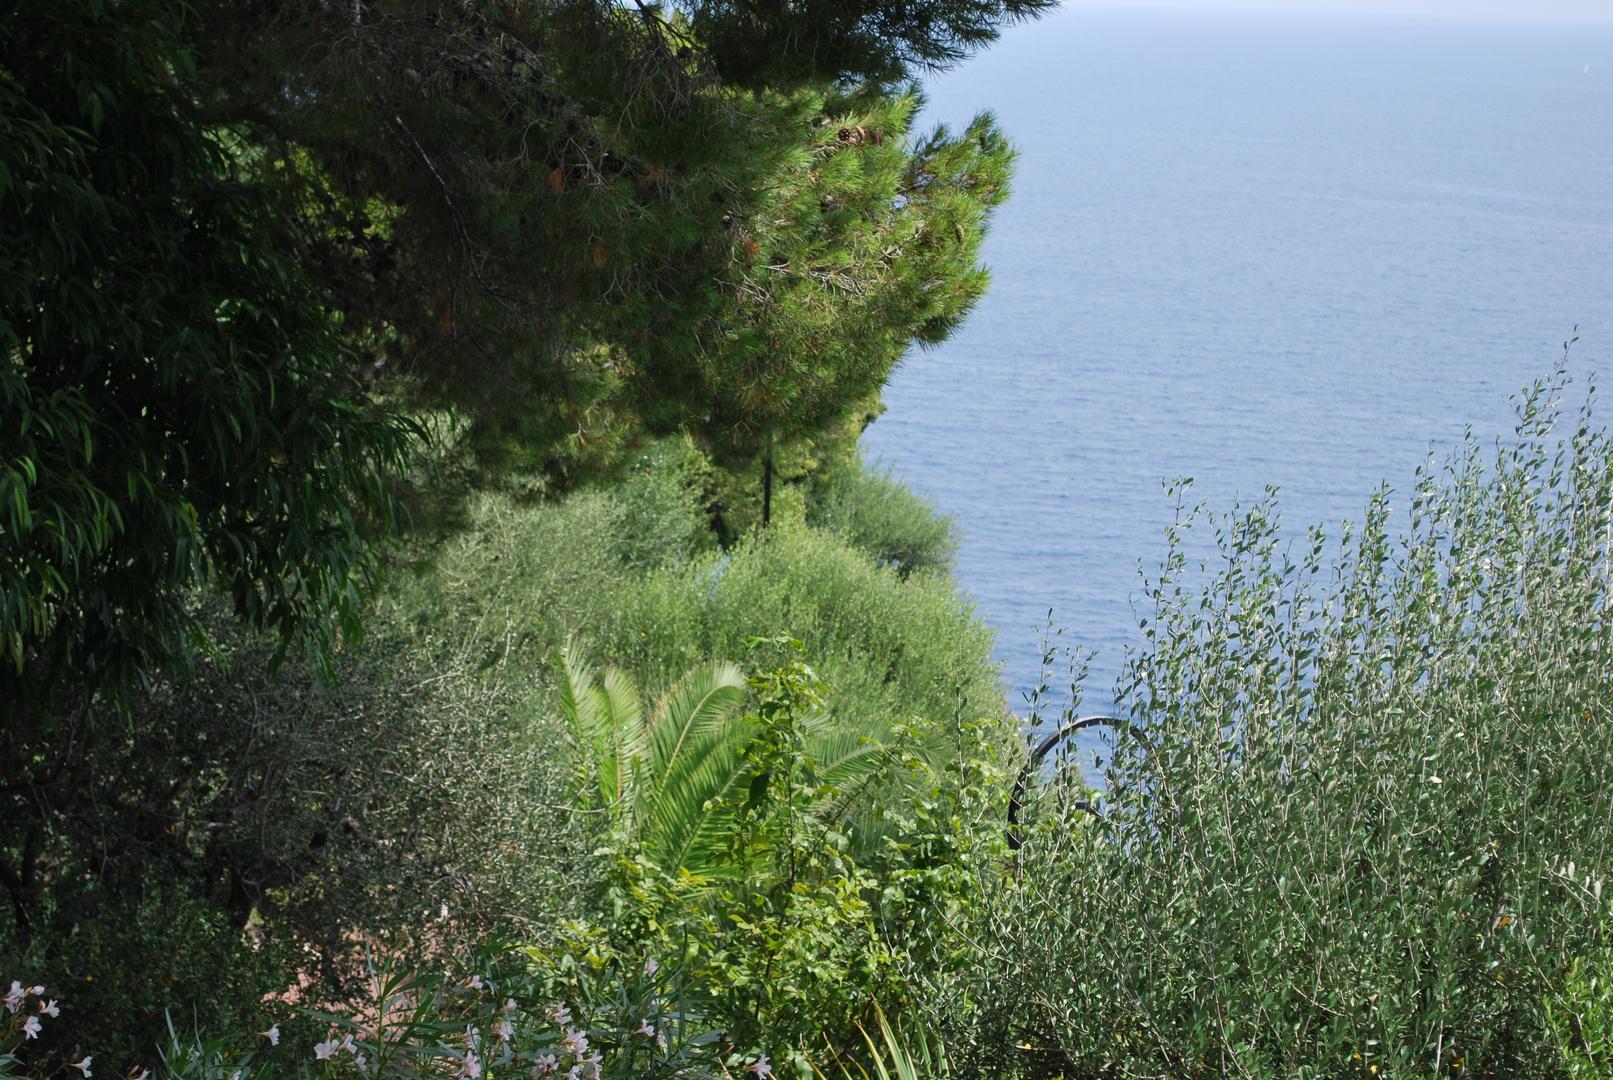 Vert paysage